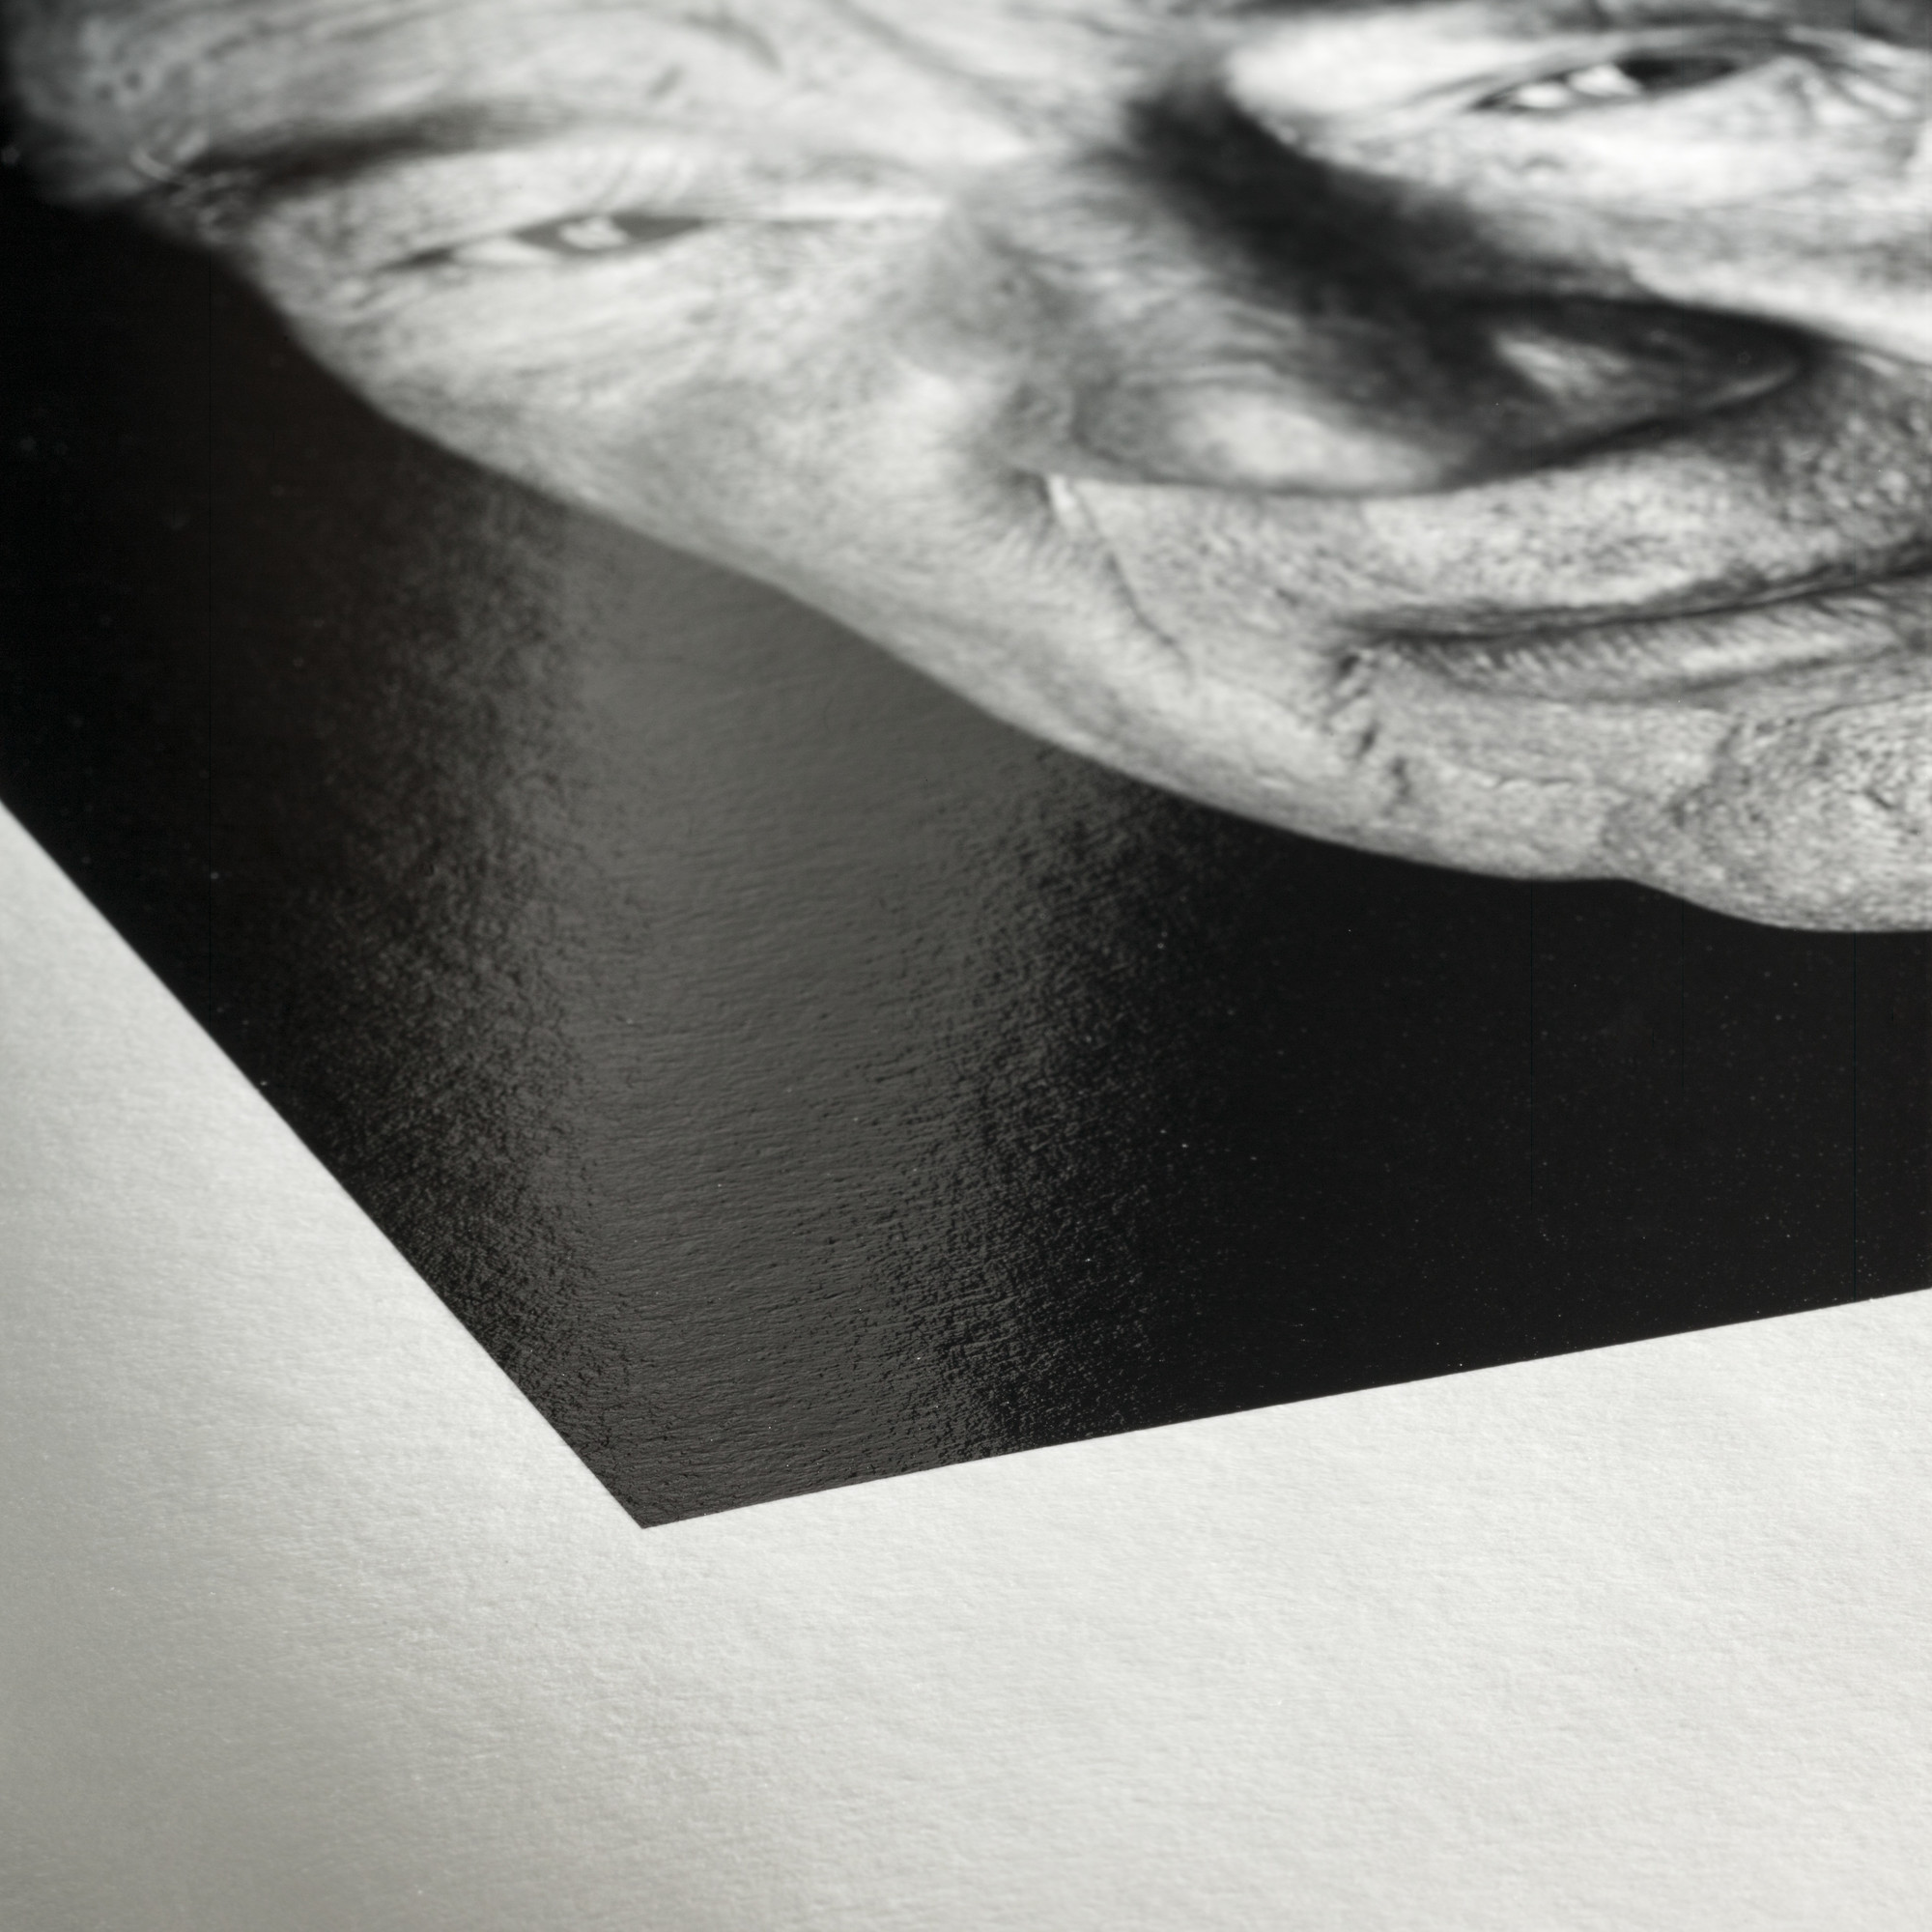 Hahnemühle Fine Art Baryta 325grm, Jan R Smit Fine Art Printing Specialist